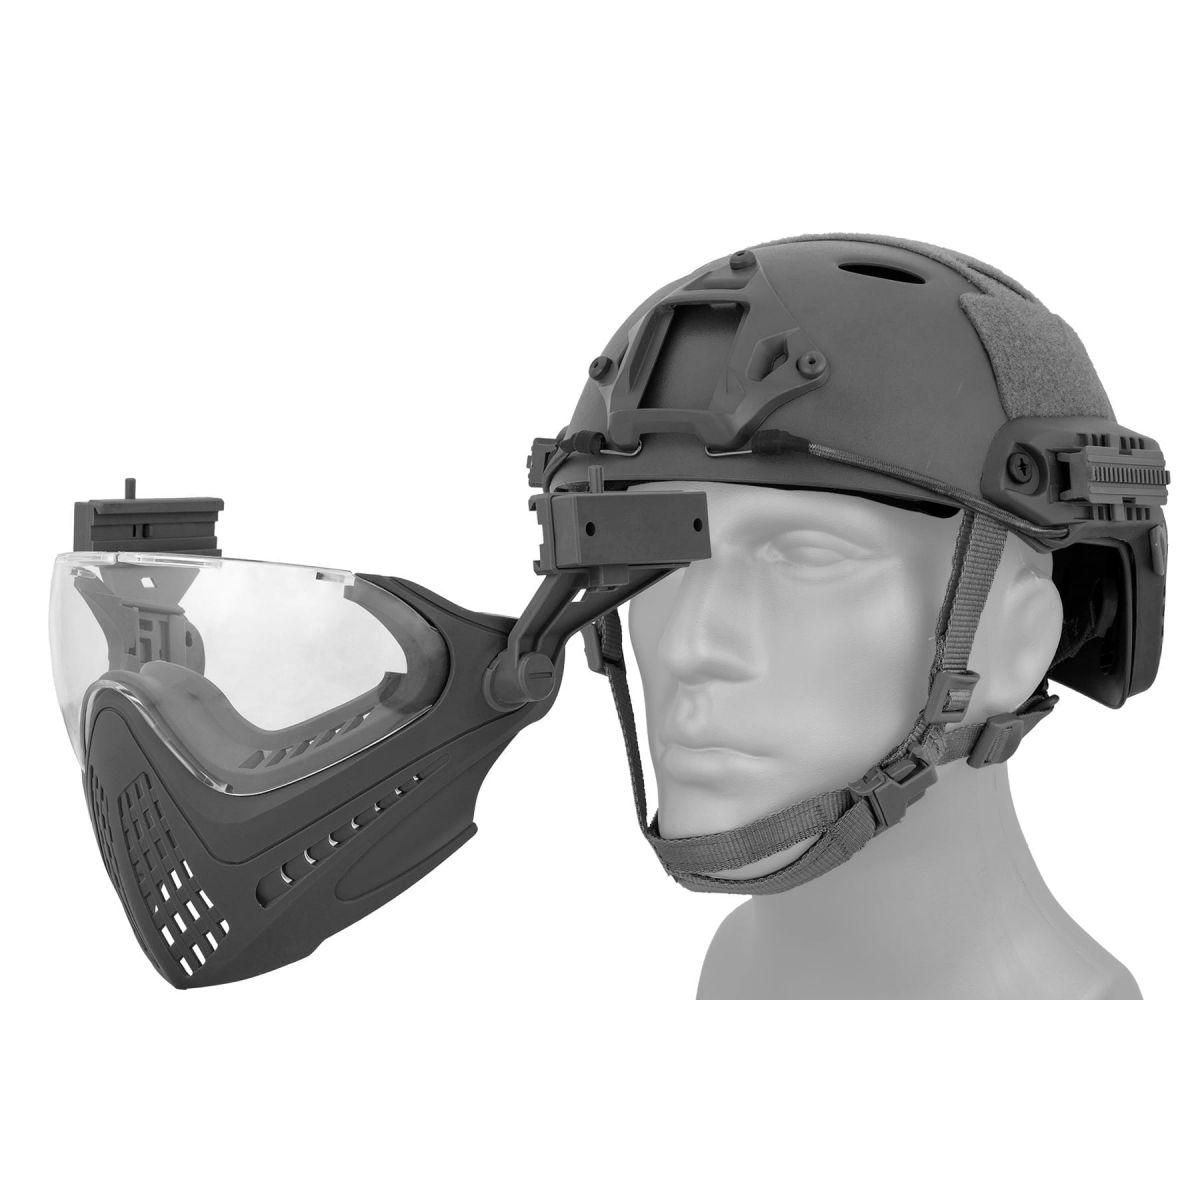 WOSPORT PILOTEER FAST HELMET FACE MASK BLACK protect